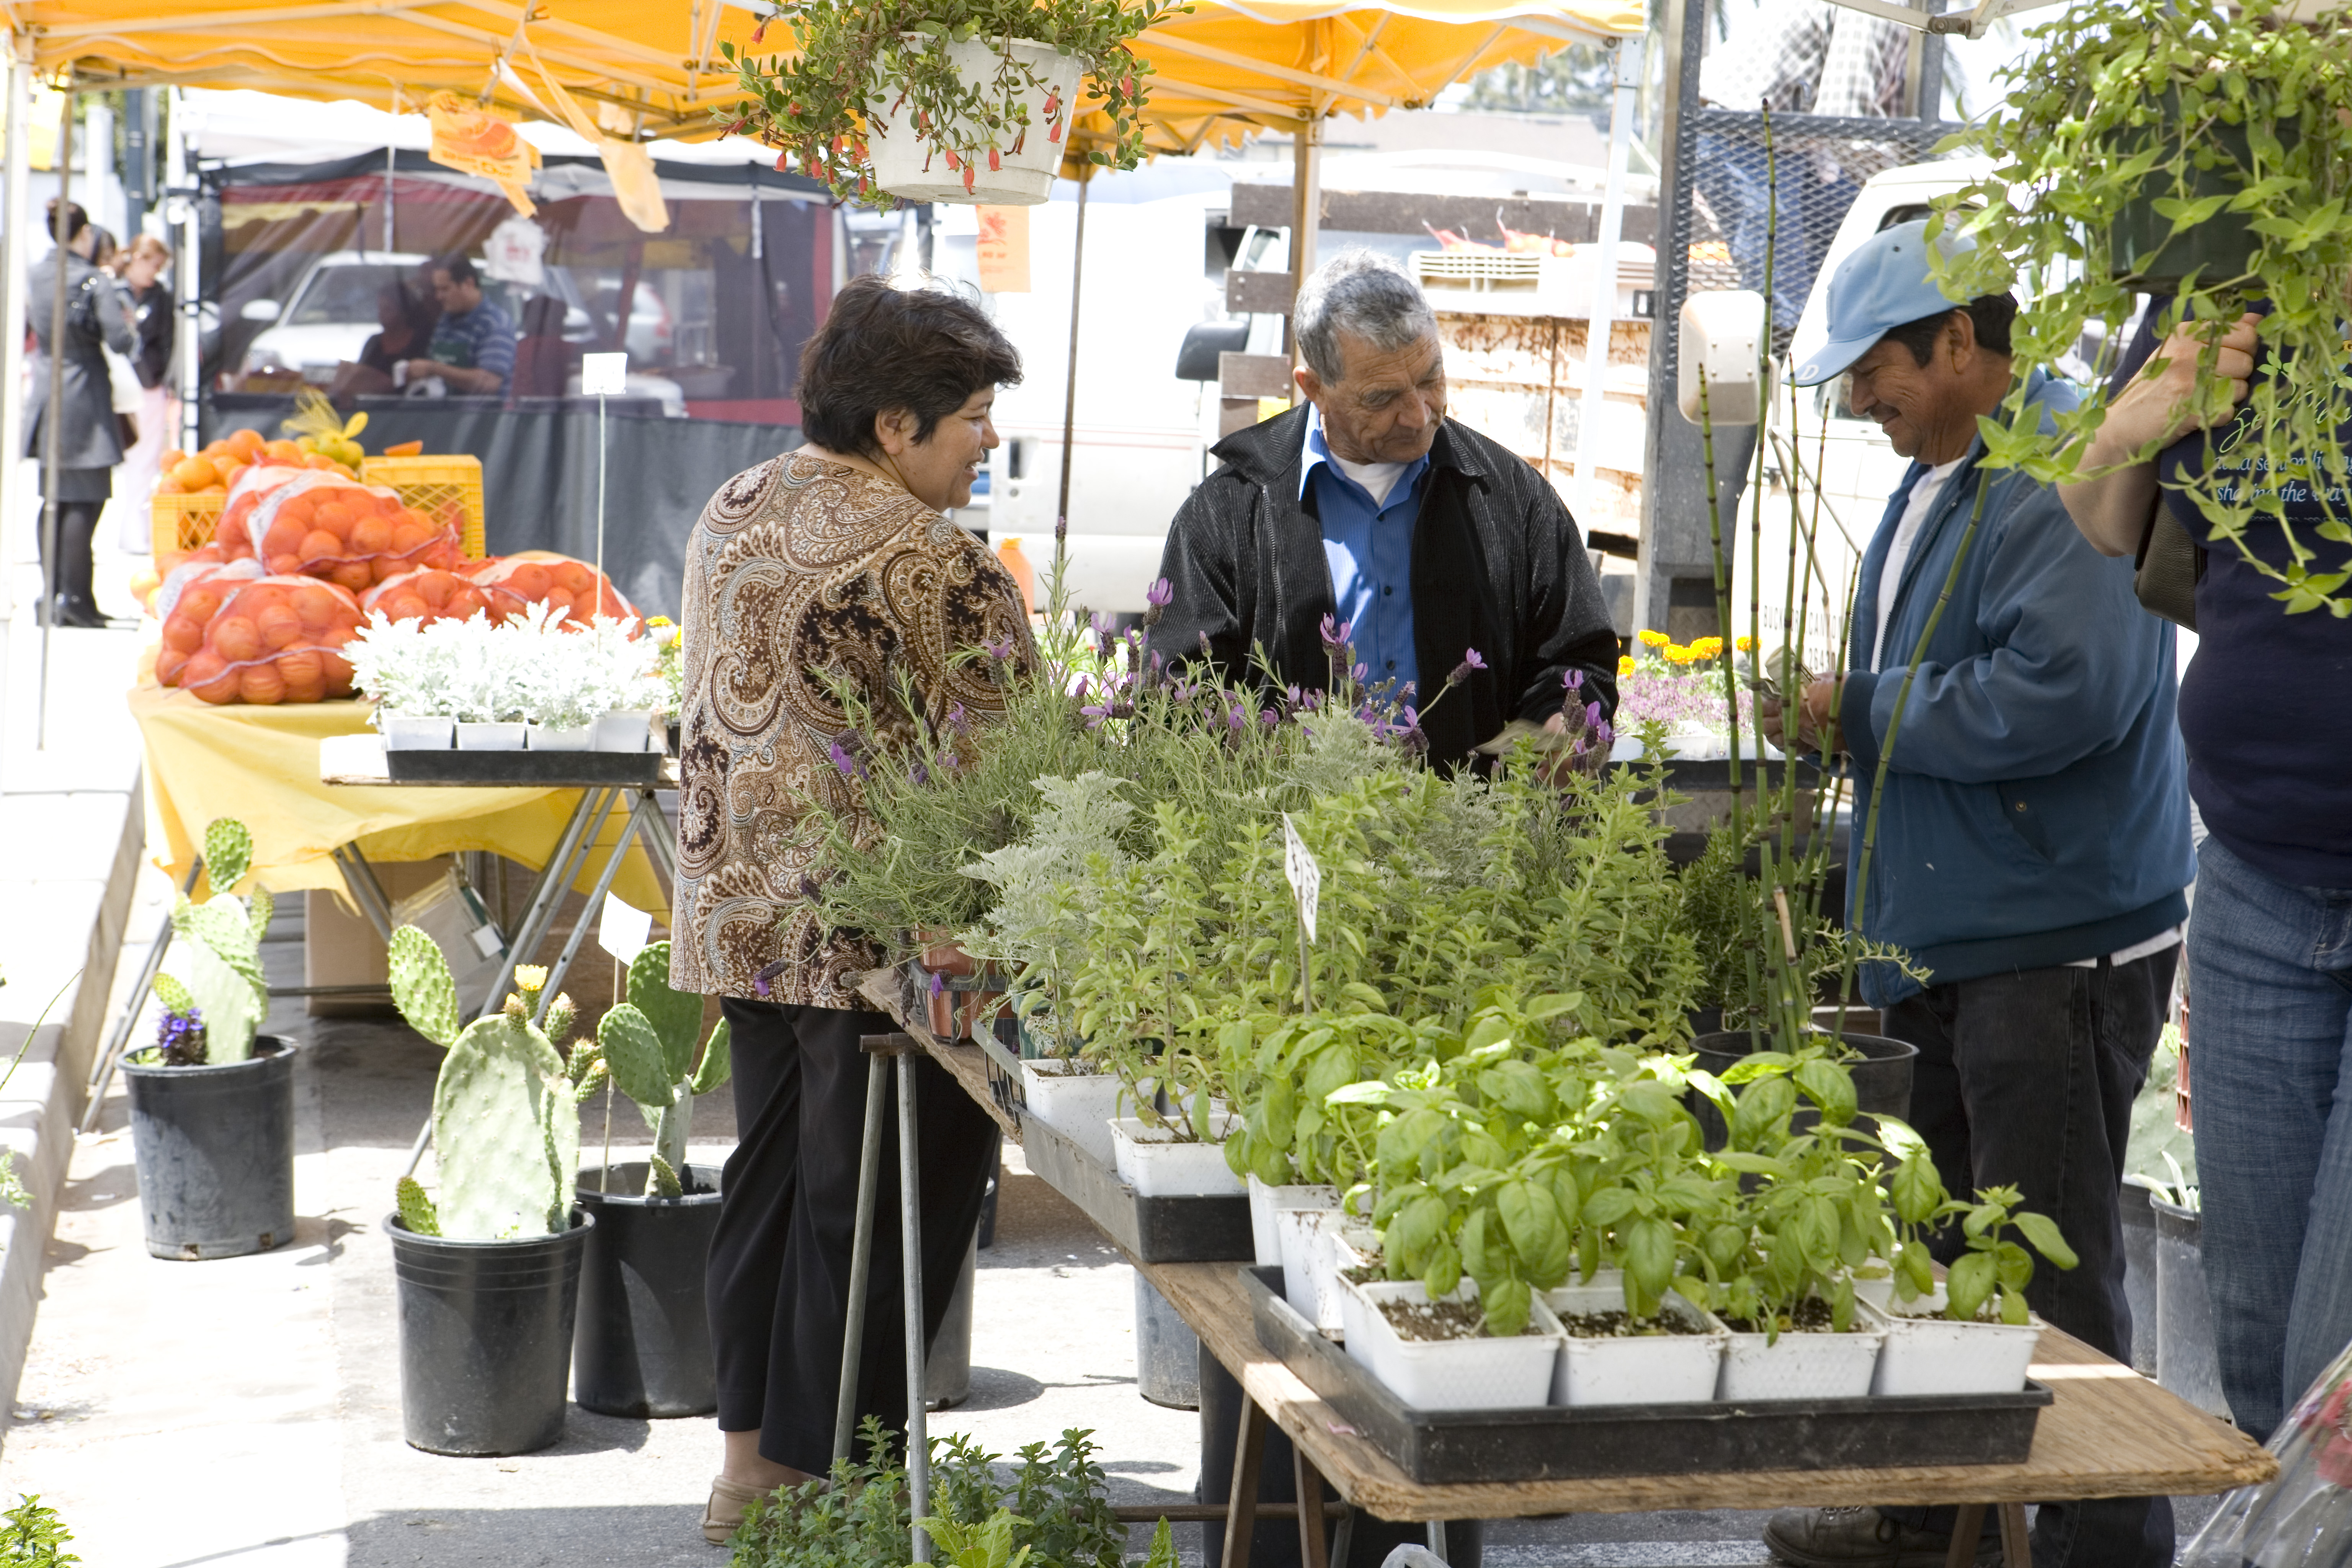 Downtown Oxnard Farmers Market